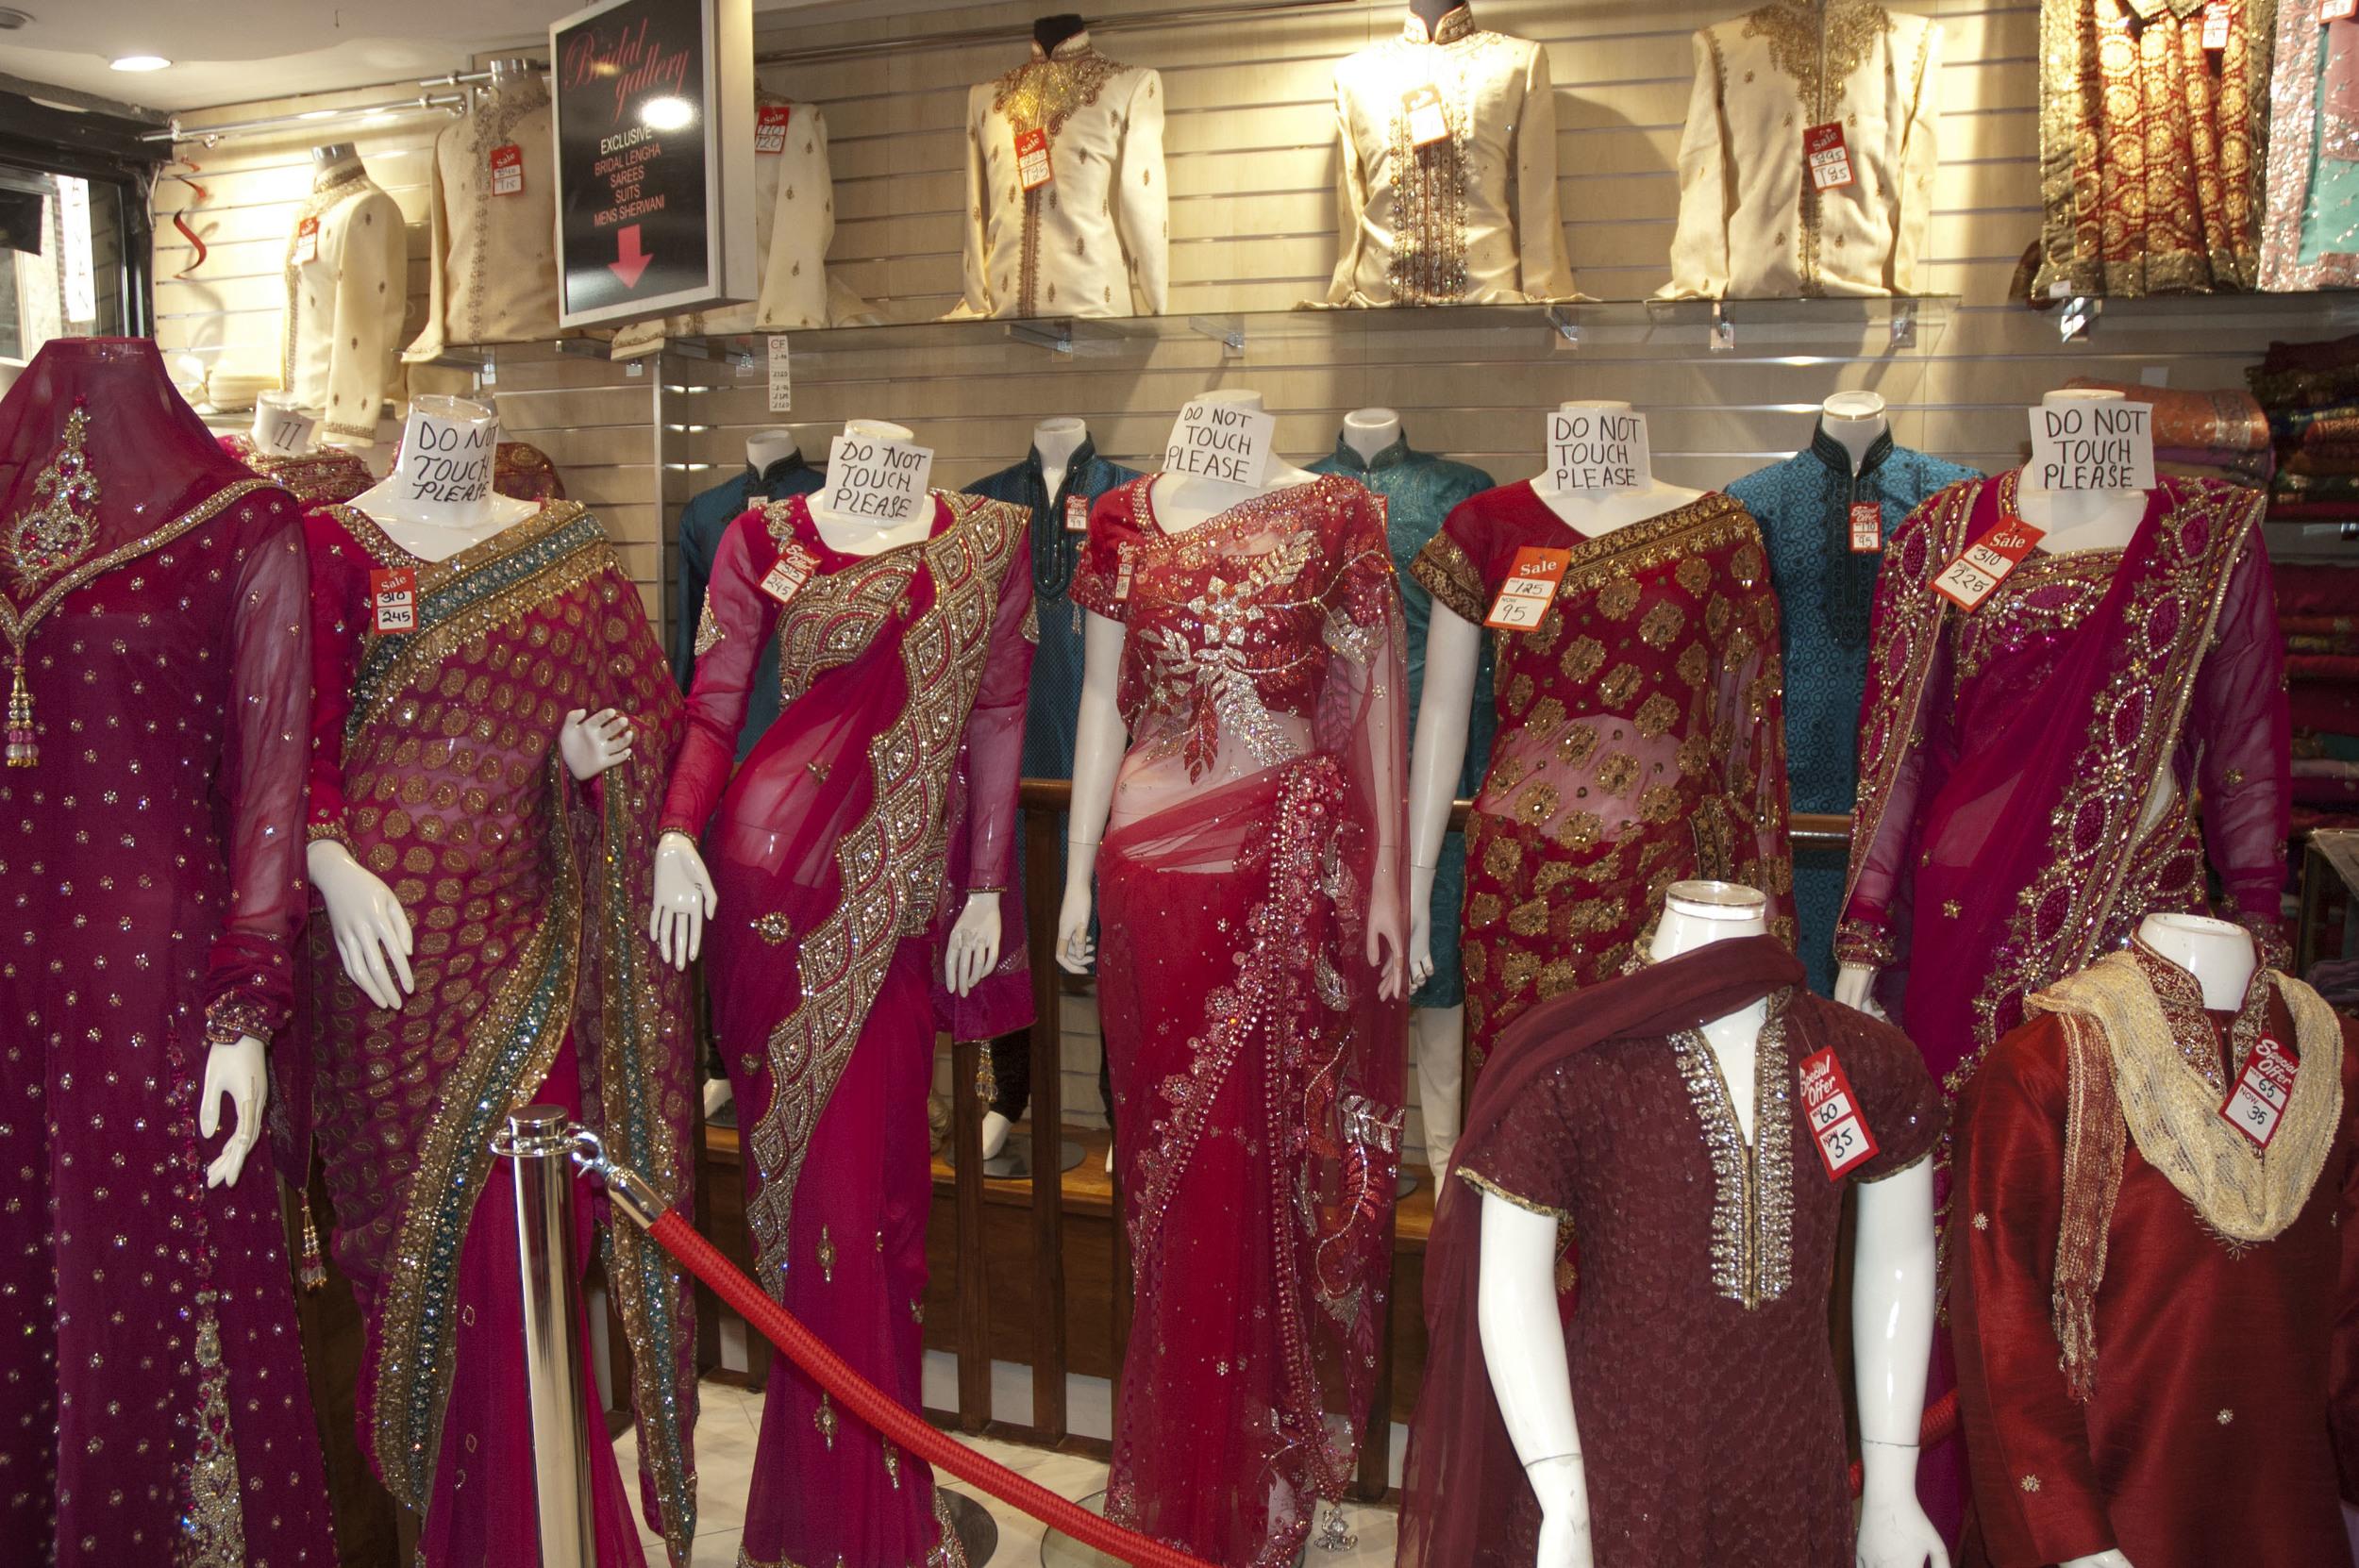 Saree mannequins image 7 of 7.JPG